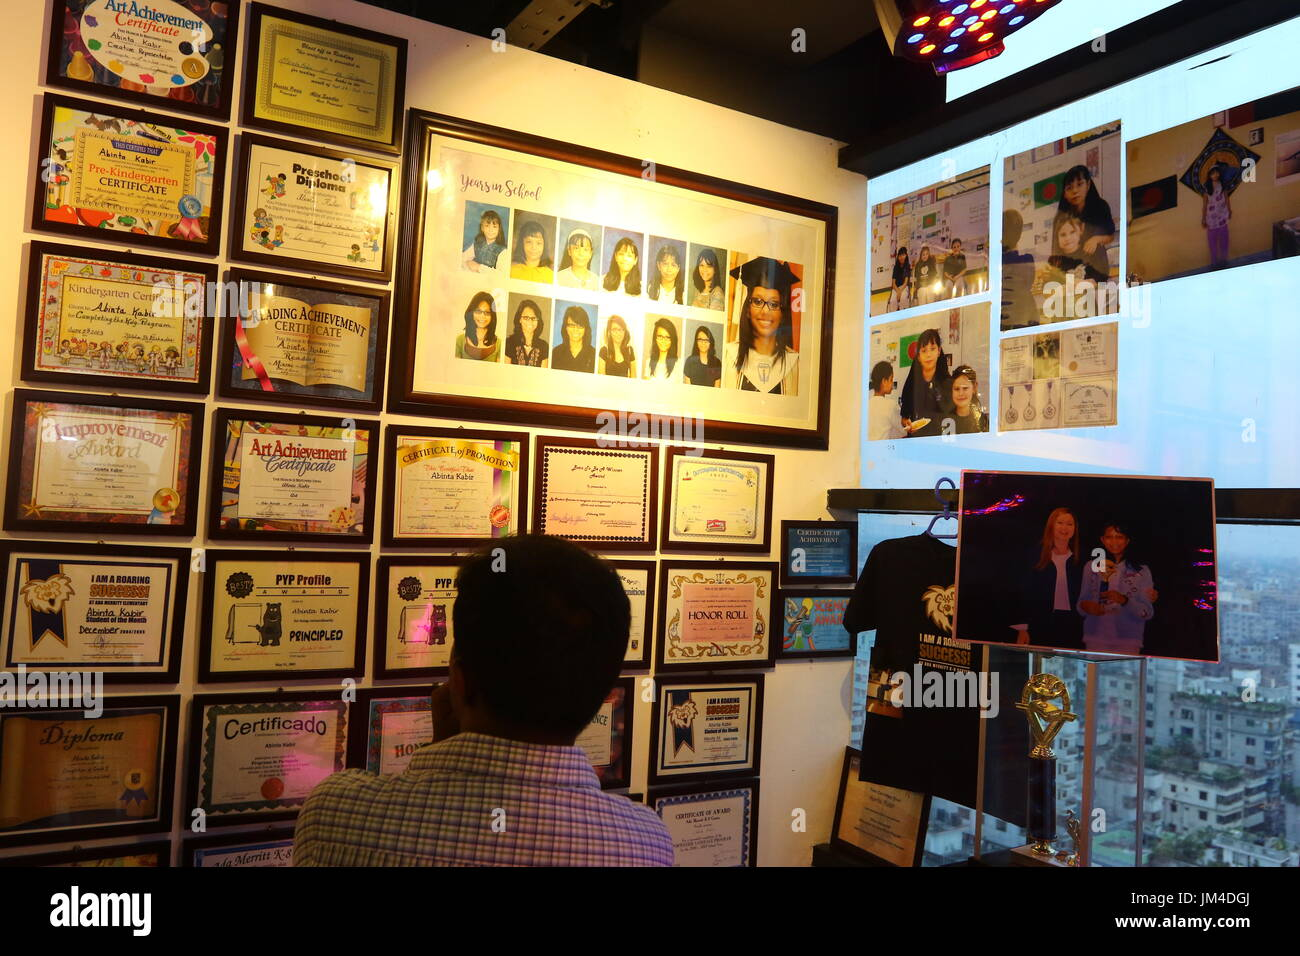 office space memorabilia. Visitors Look At The Memorabilia Of Abinta Kabir On Display In A Corner Office Space Foundation. Was Killed During Terro